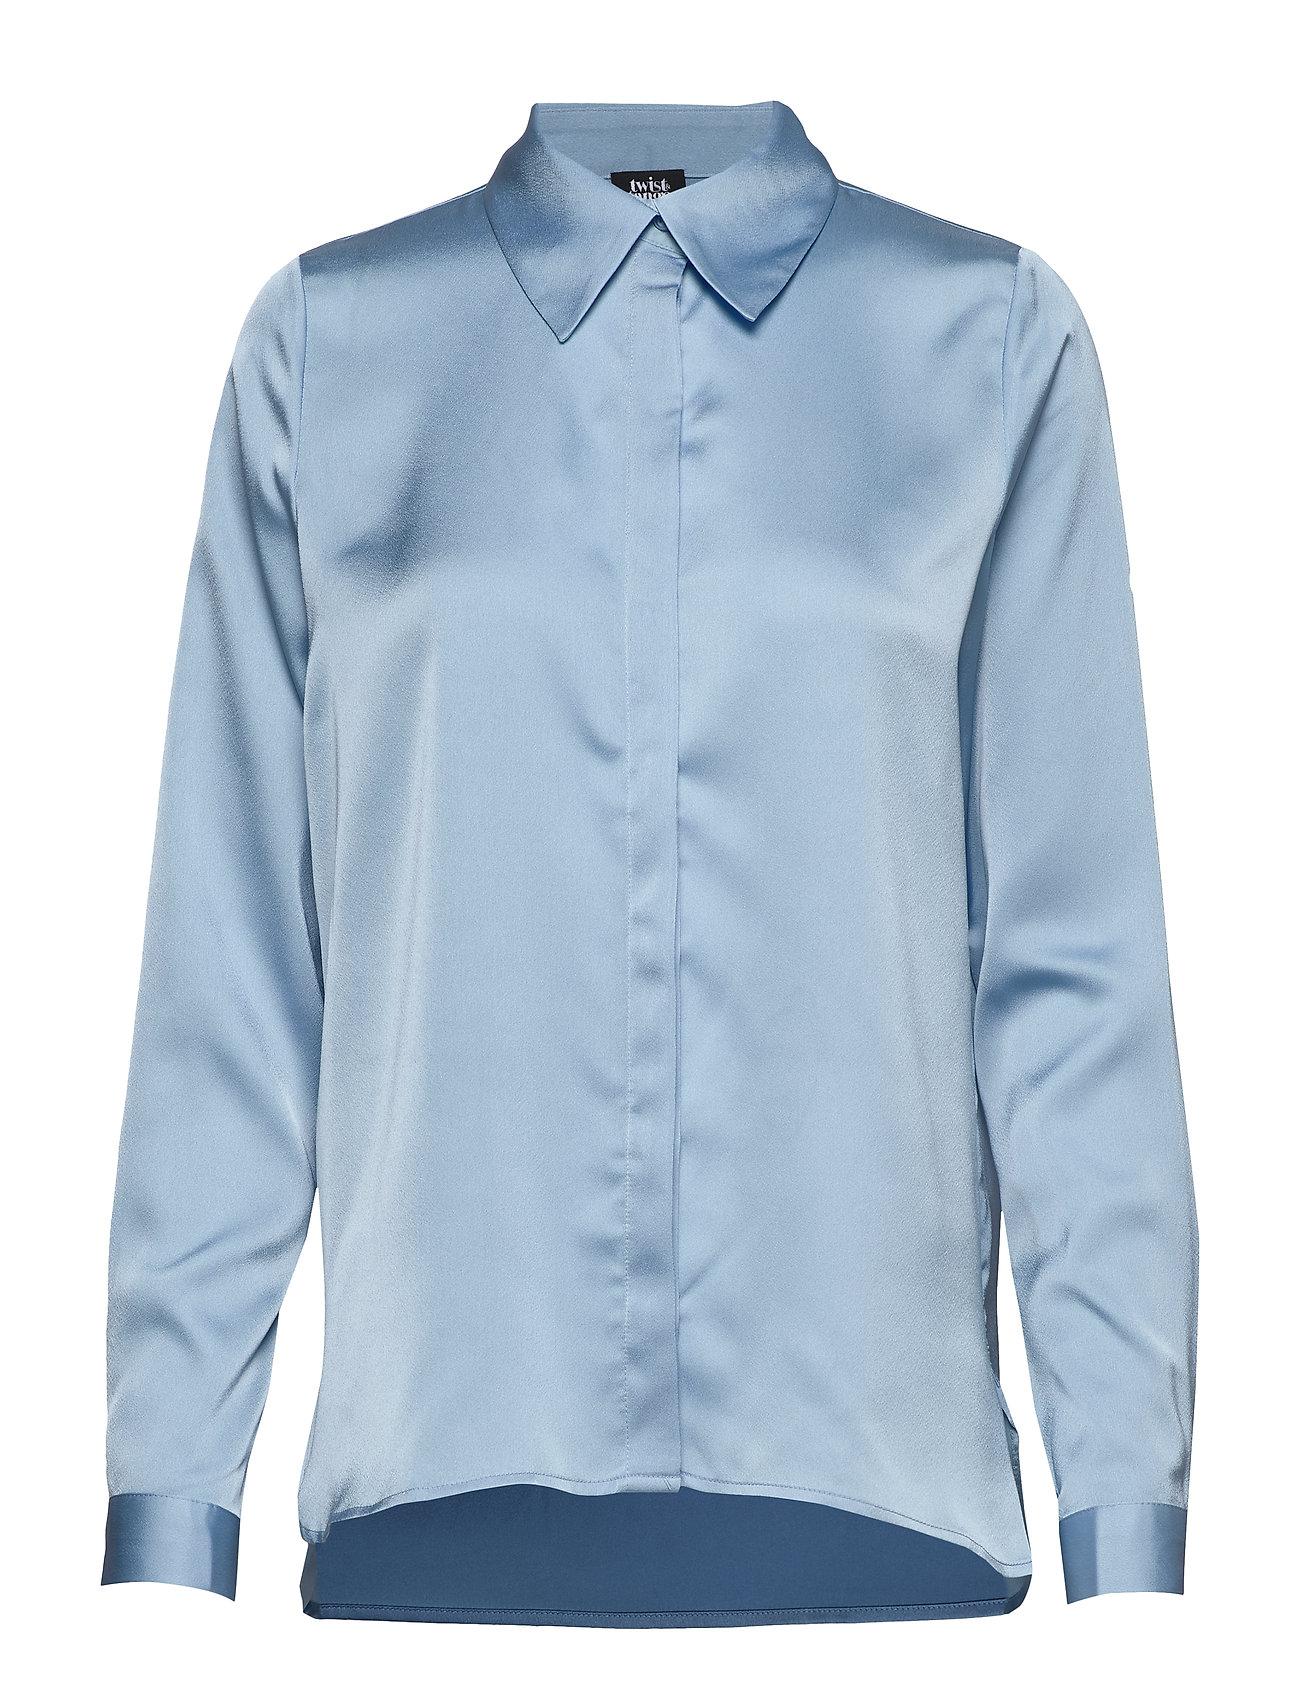 Twist & Tango Penelope Shirt - SKYBLUE